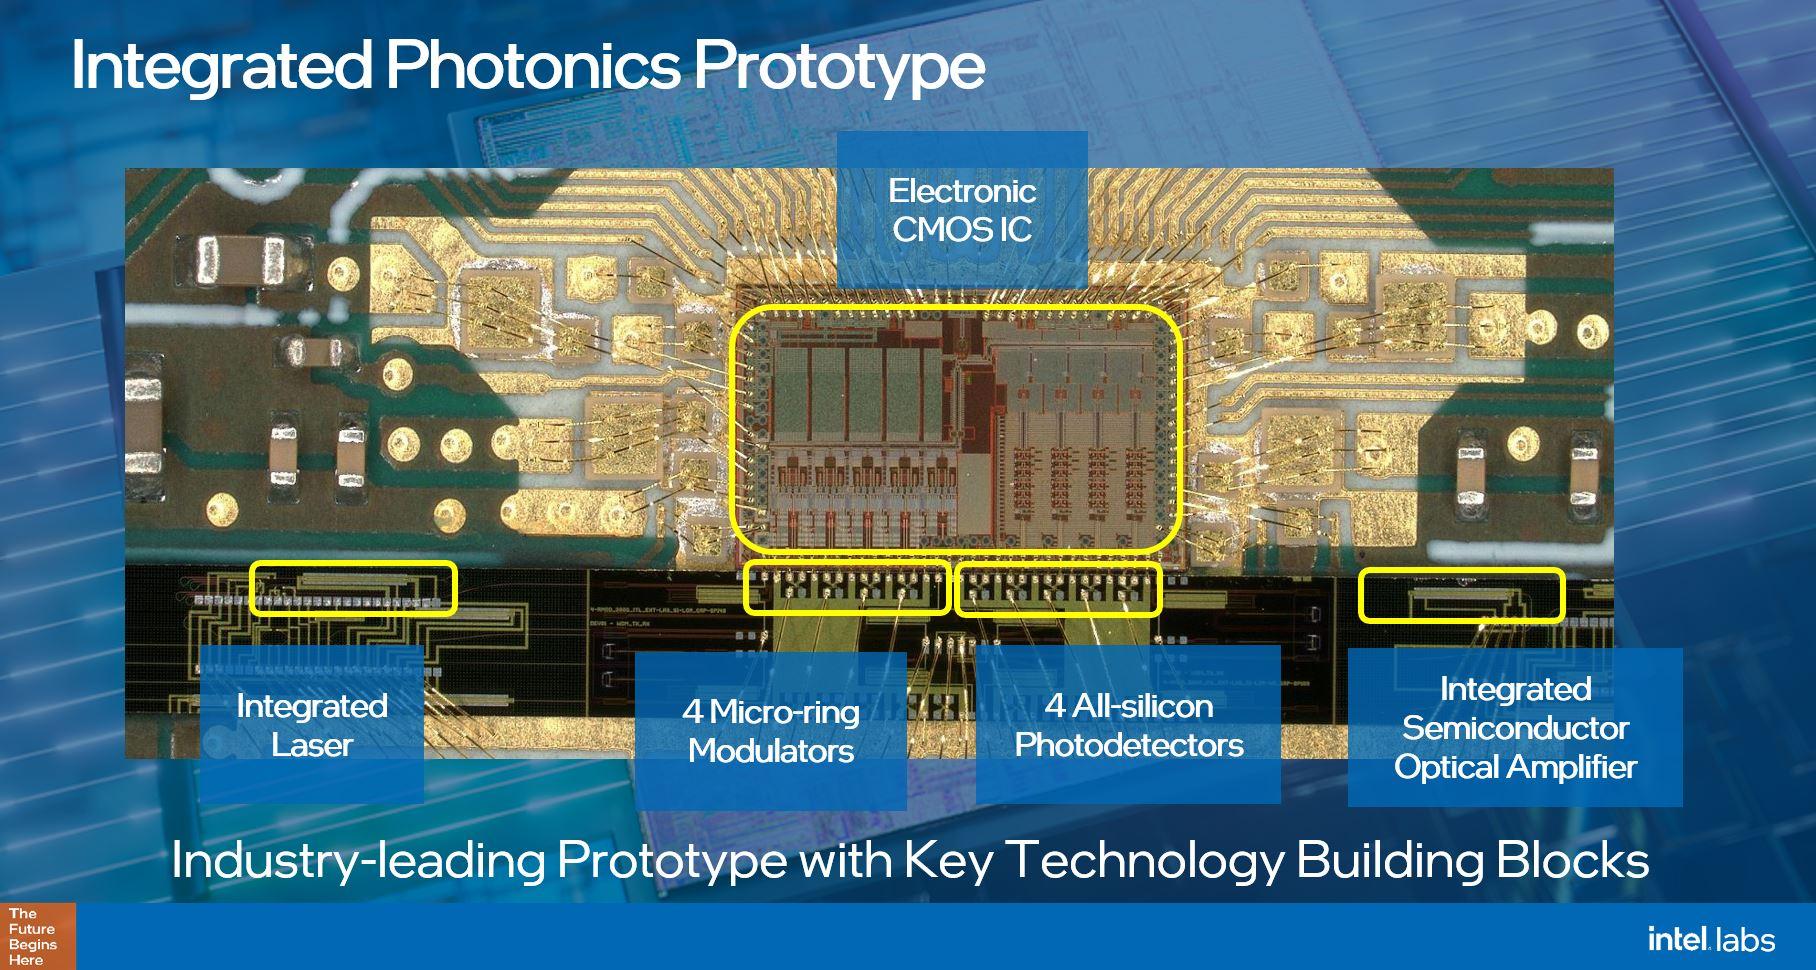 Intel Silicon Integrated Photonics Prototype